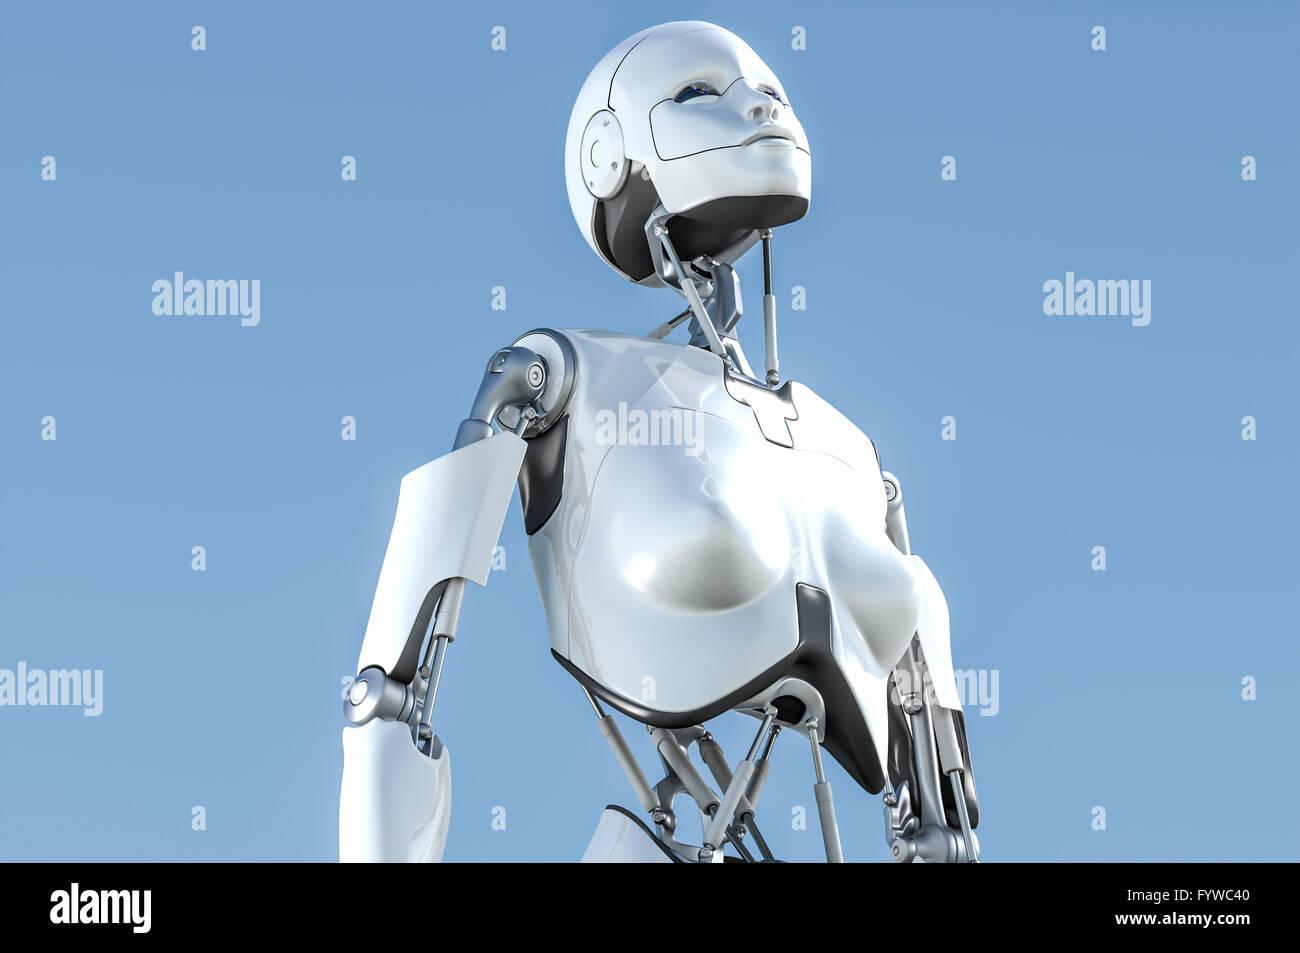 Femmina robot umanoide guardando in alto nel cielo. Immagini Stock